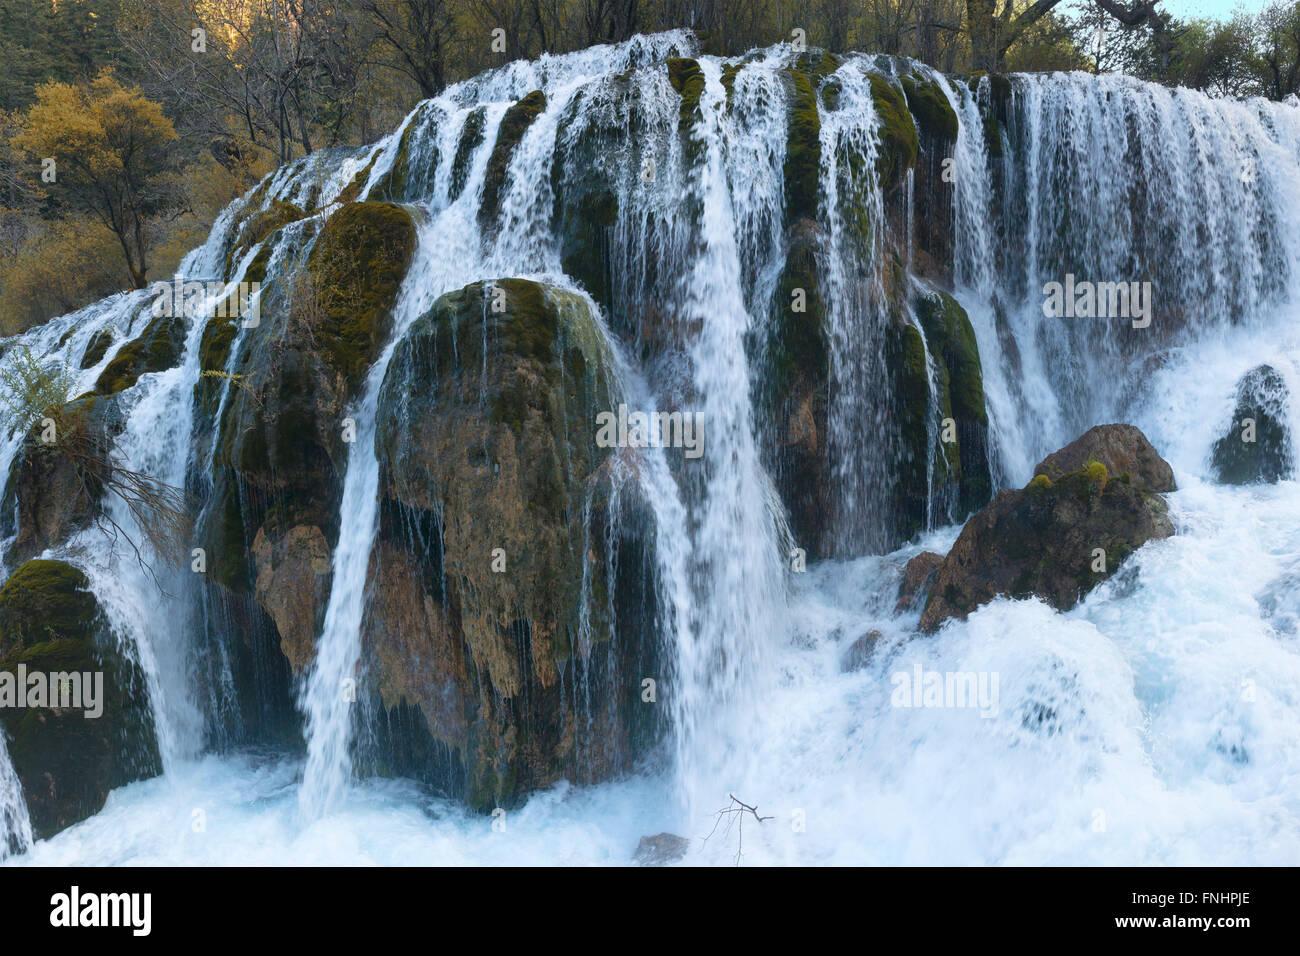 Bambus See Wasserfall Nationalpark Jiuzhaigou Provinz Sichuan